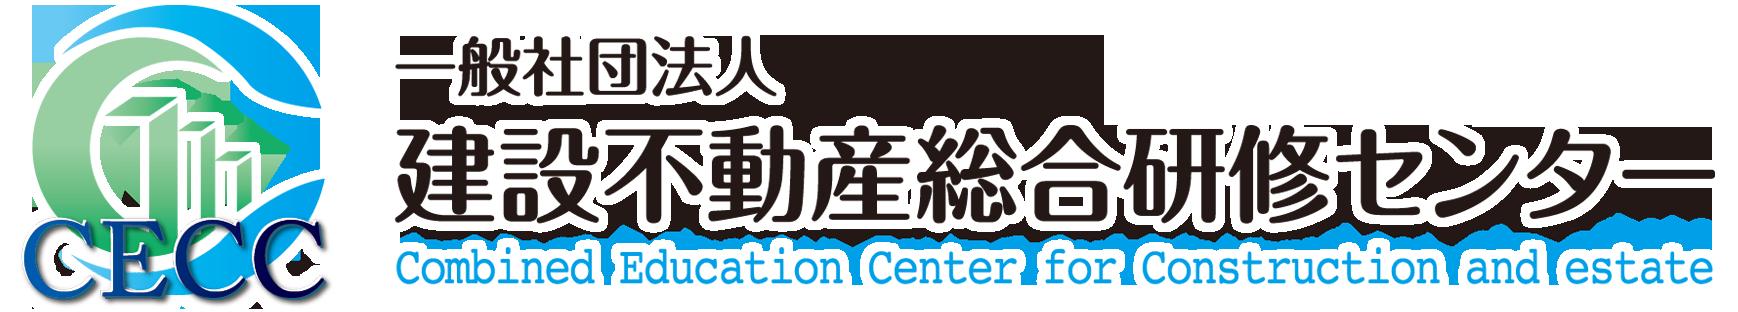 一般社団法人 建設不動産総合研修センター